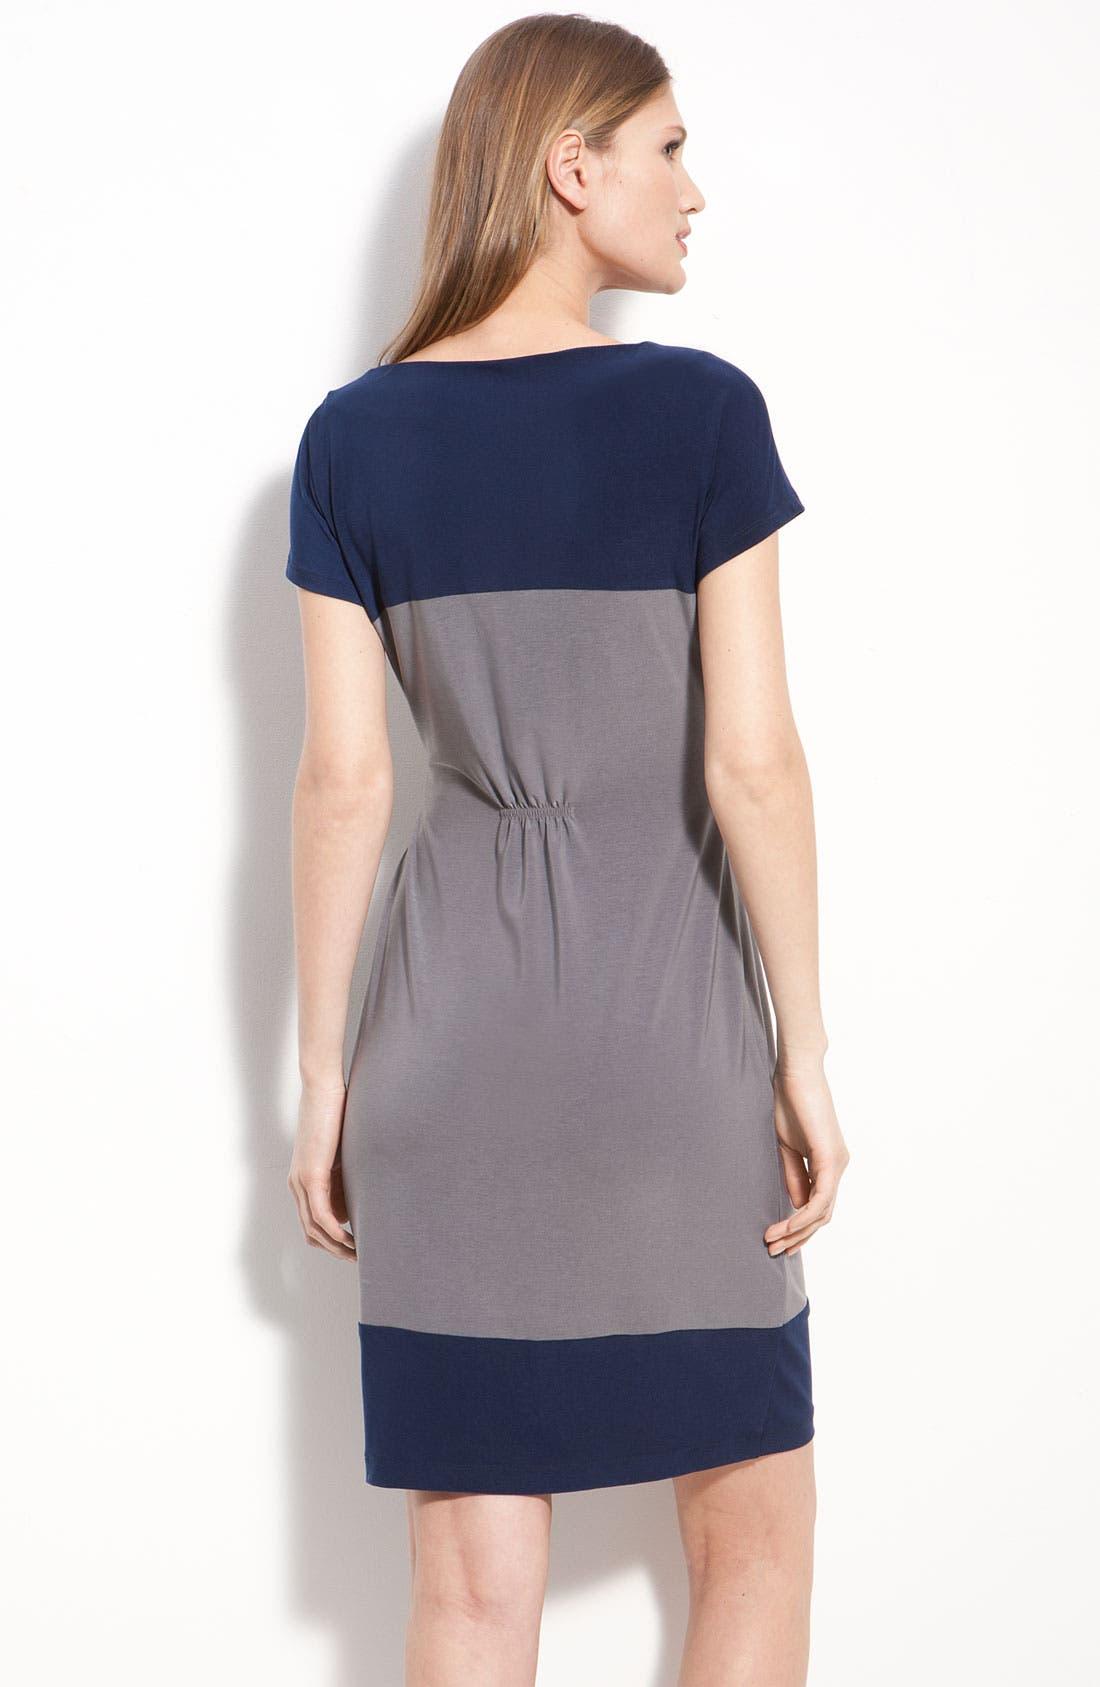 ALEX & AVA, Twist Front Colorblock Jersey Sheath Dress, Alternate thumbnail 3, color, 020